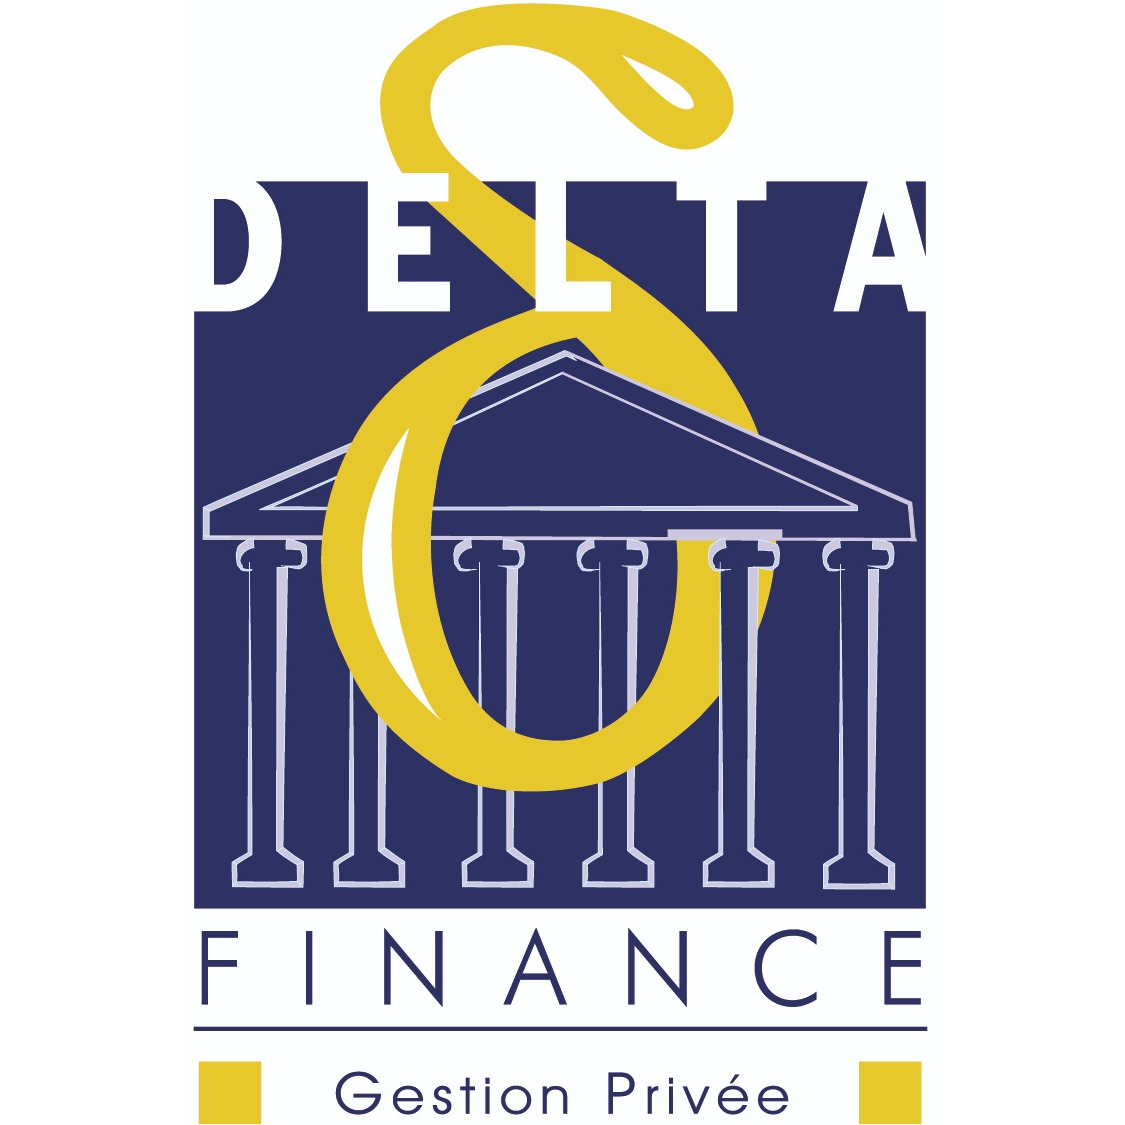 the DELTA FINANCE logo.